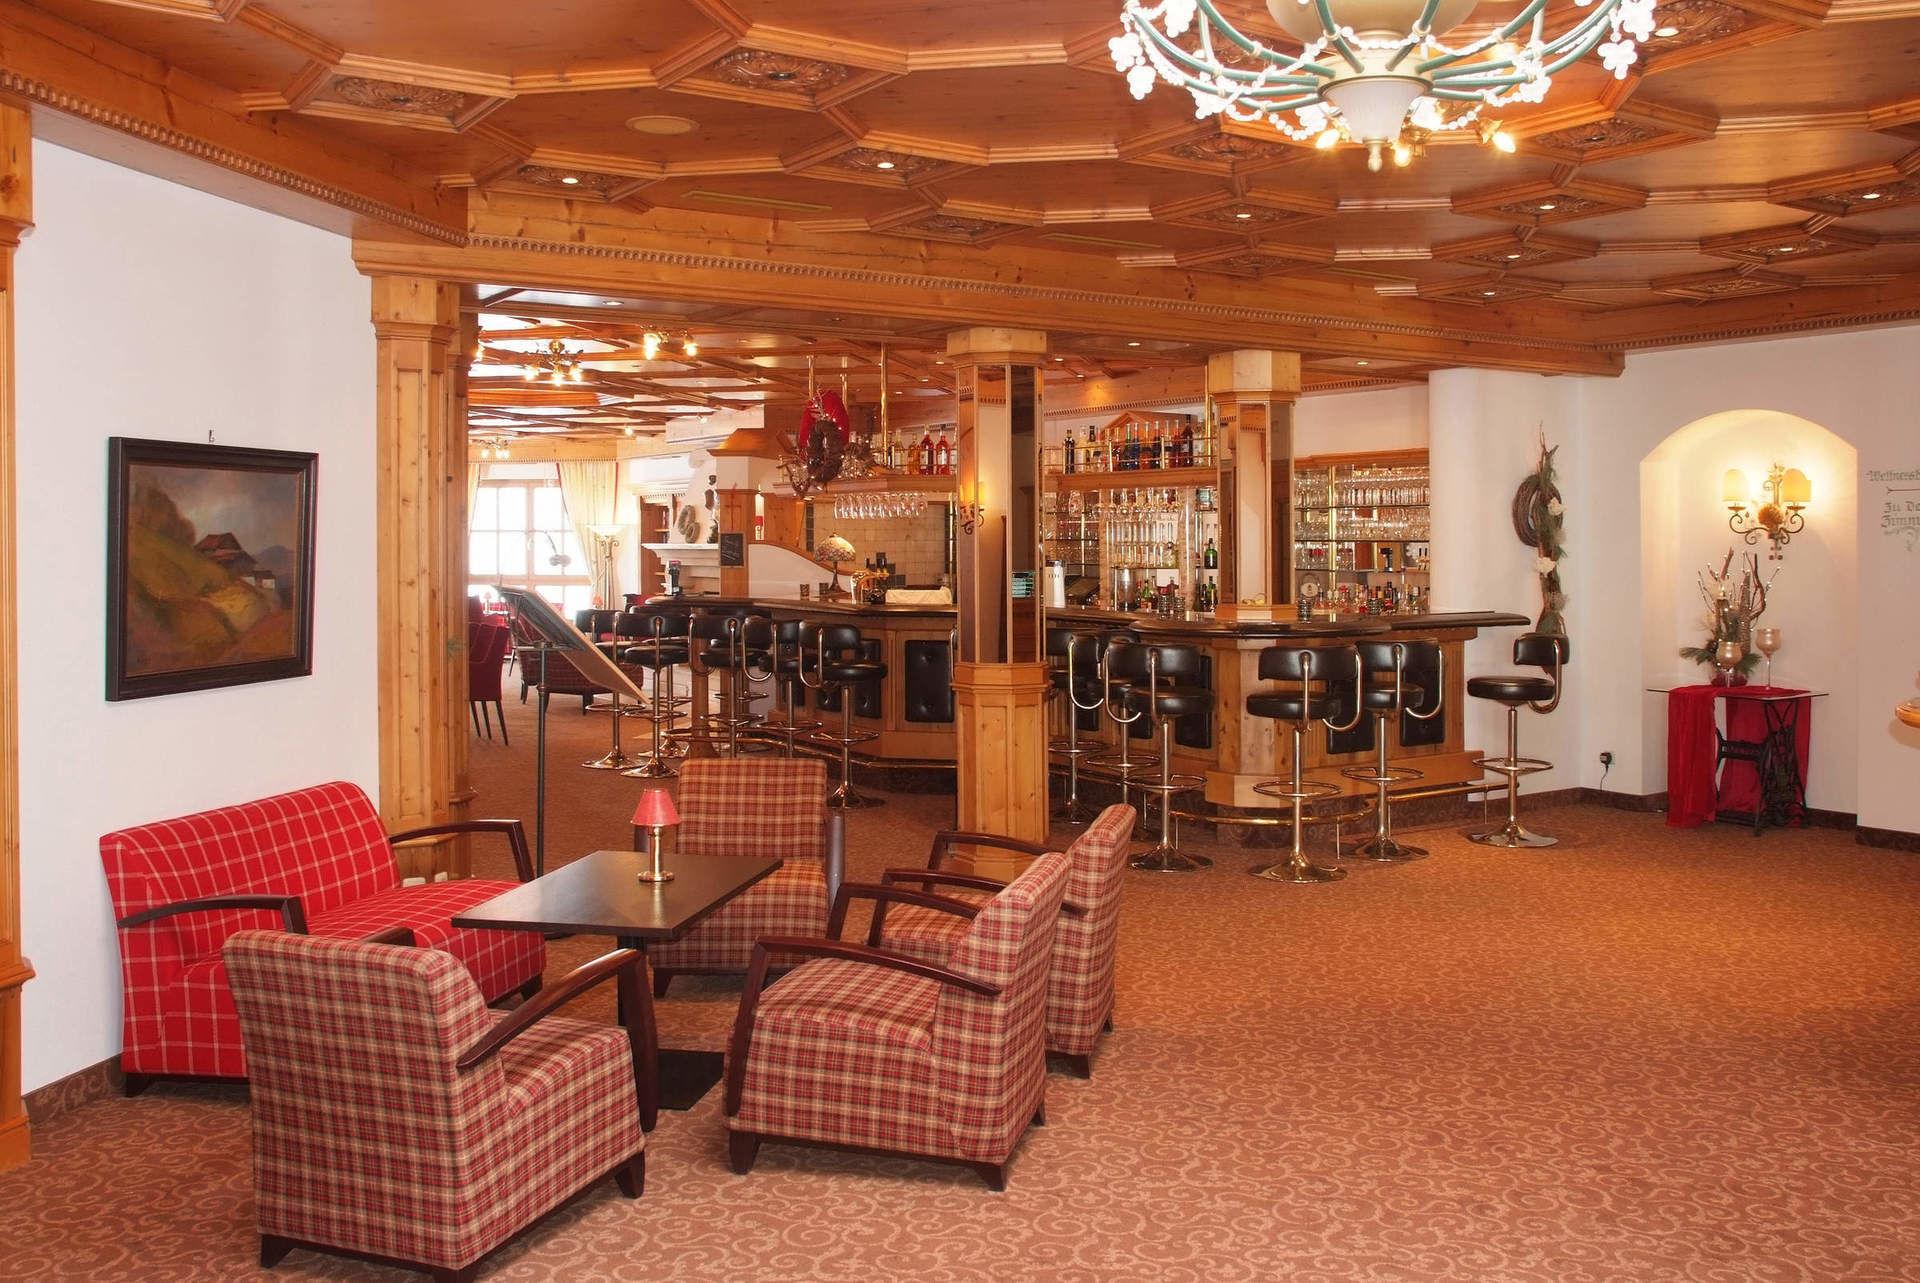 impressum hotel neue post bodenmais wellnesshotel wellnessurlaub wellness hotels bayern. Black Bedroom Furniture Sets. Home Design Ideas